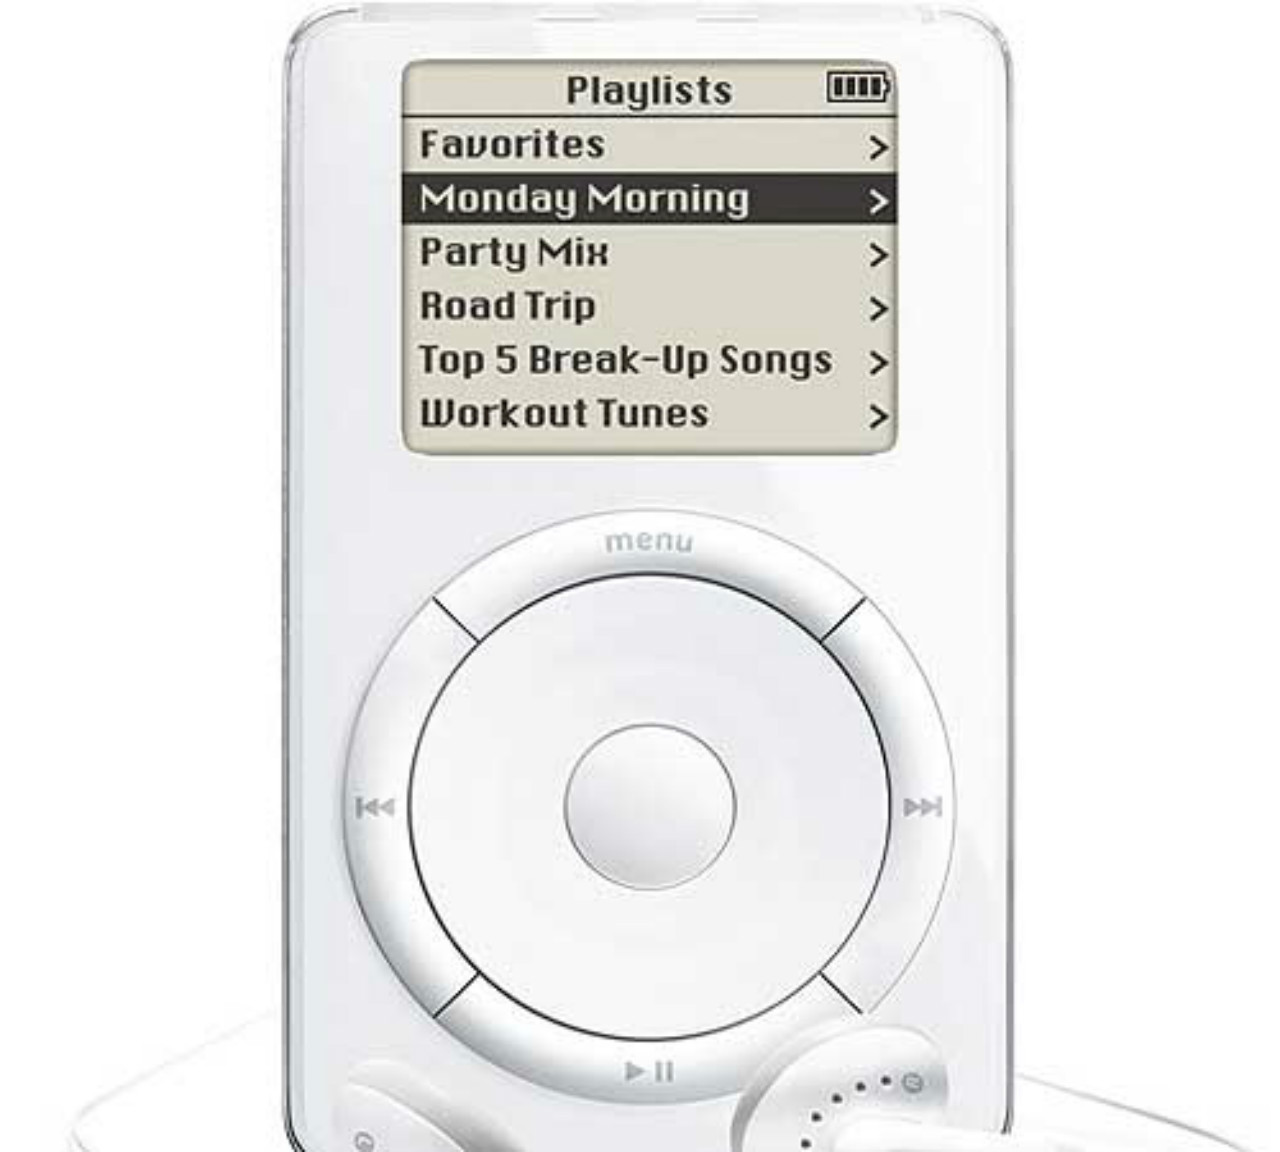 iPod, la caja mágica de Apple cumple 15 años